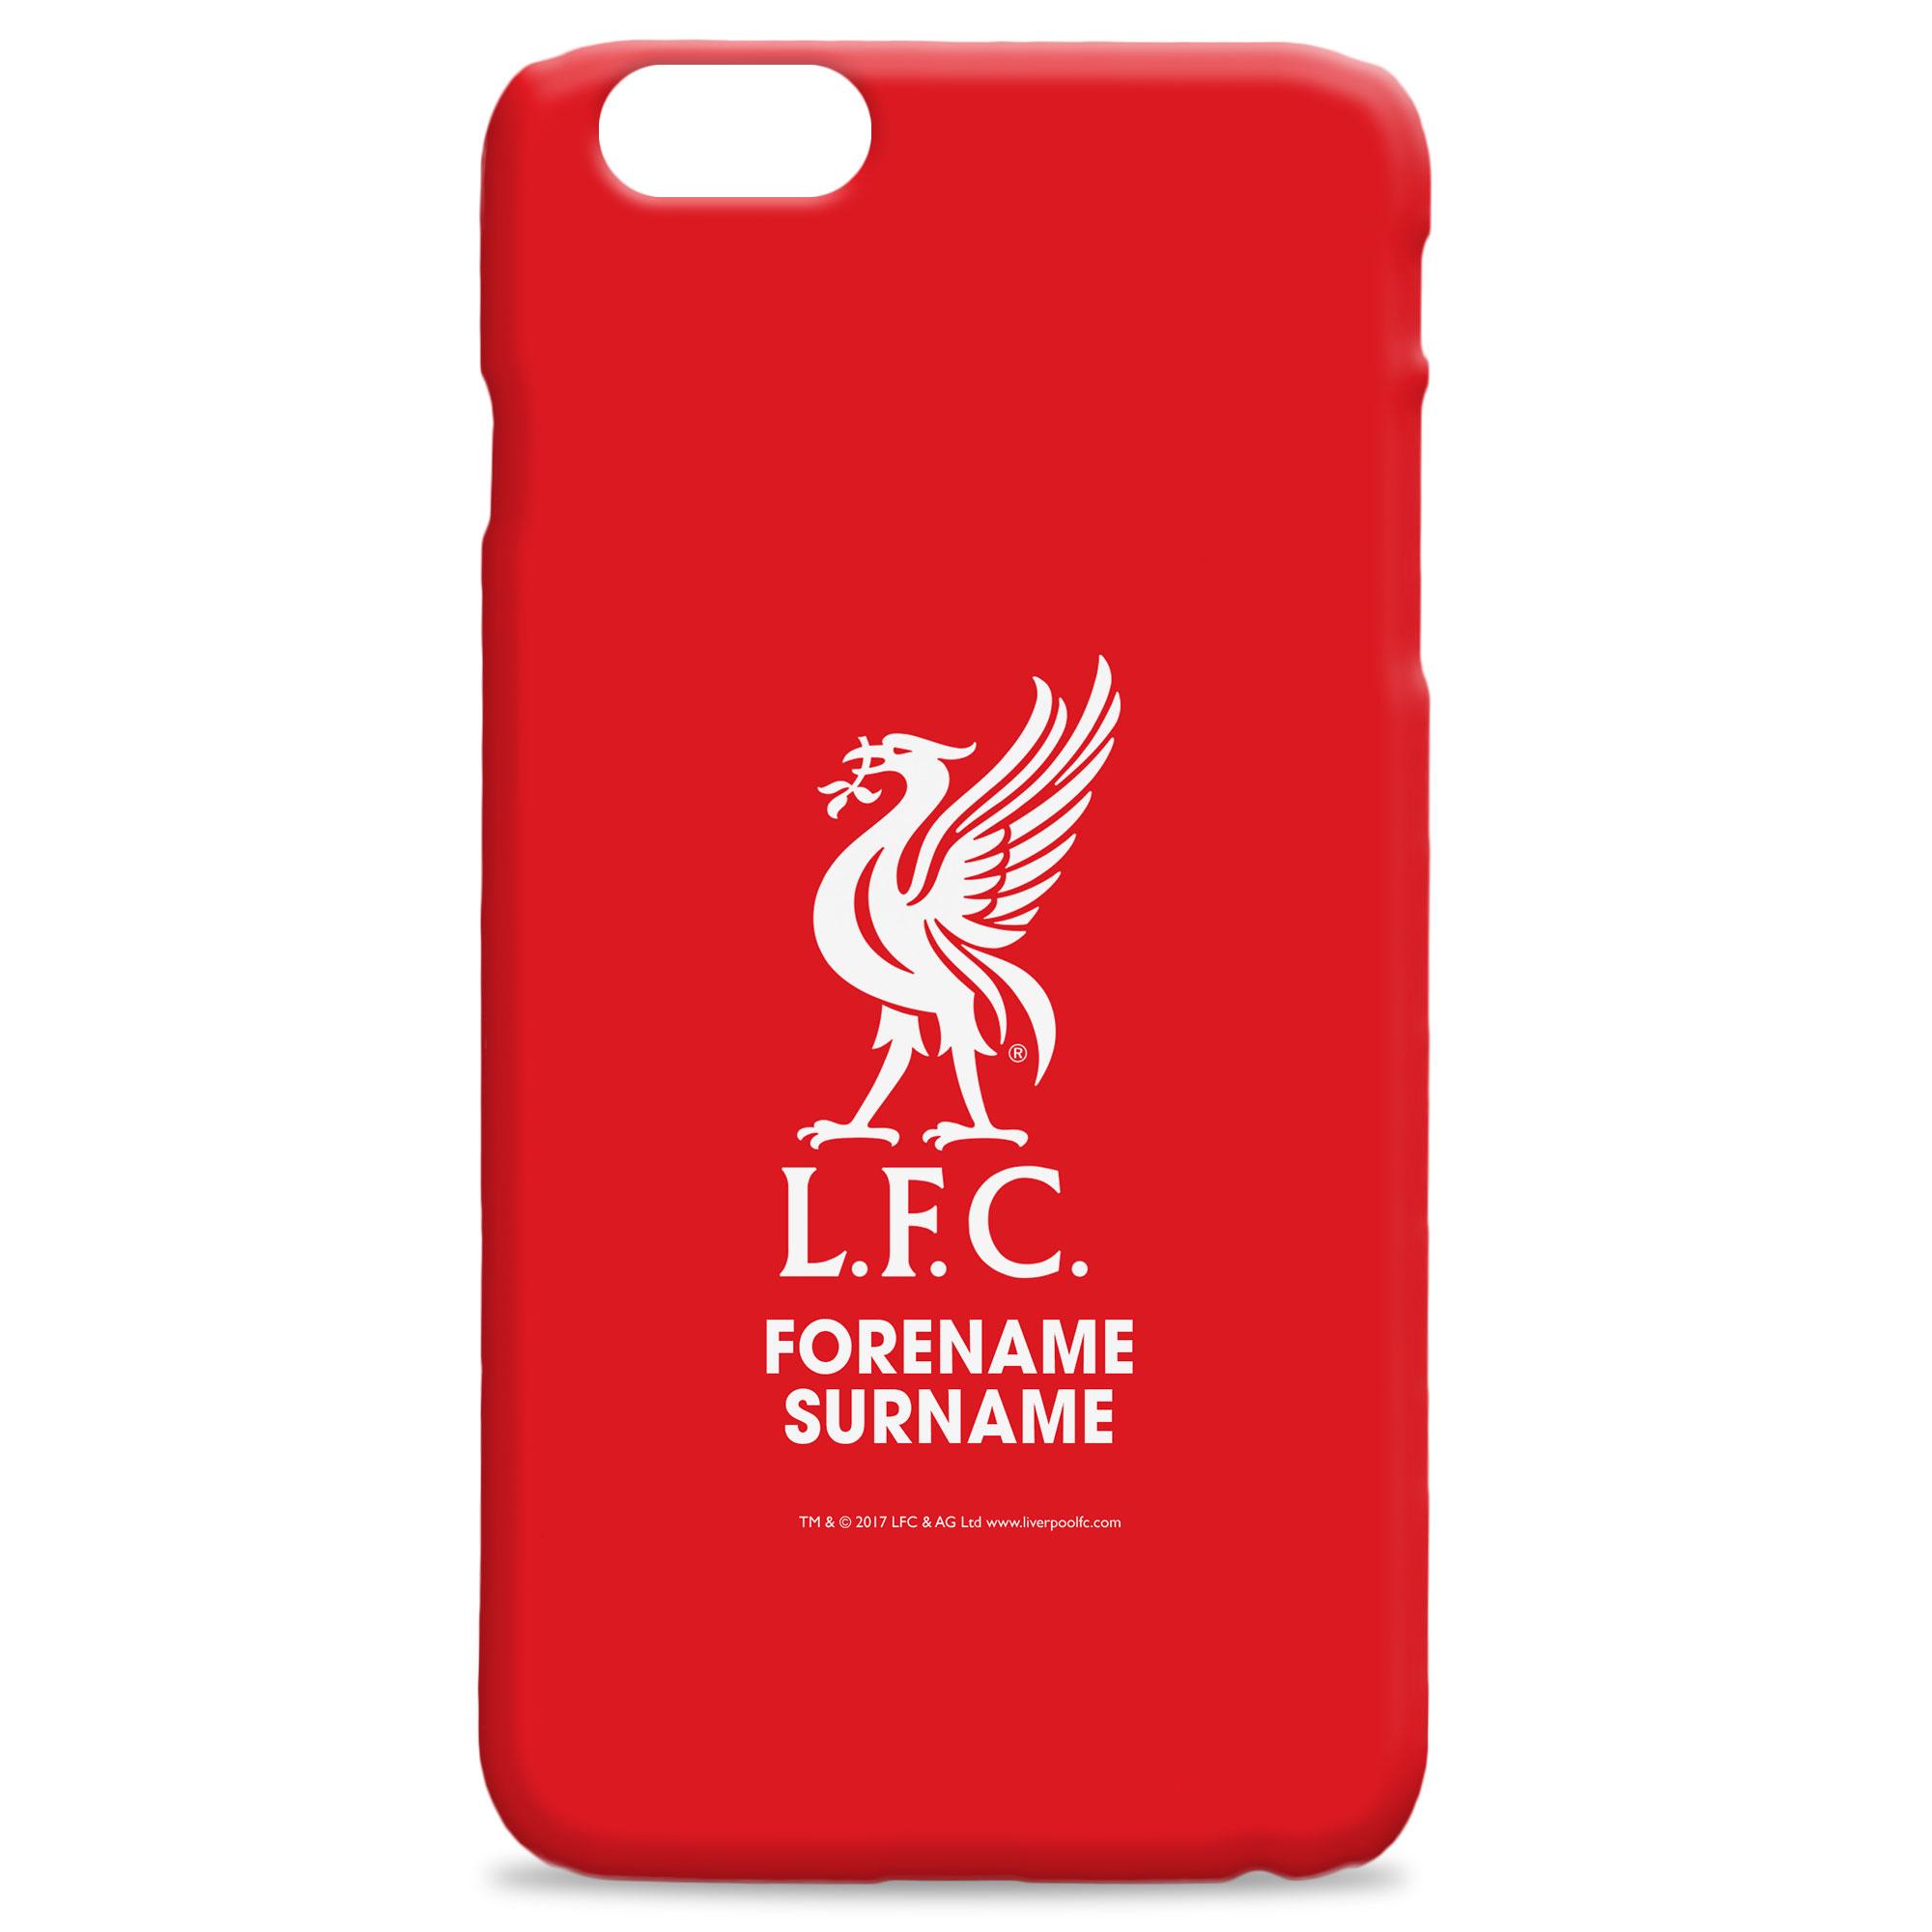 Liverpool FC Bold Crest Hard Back Phone Case